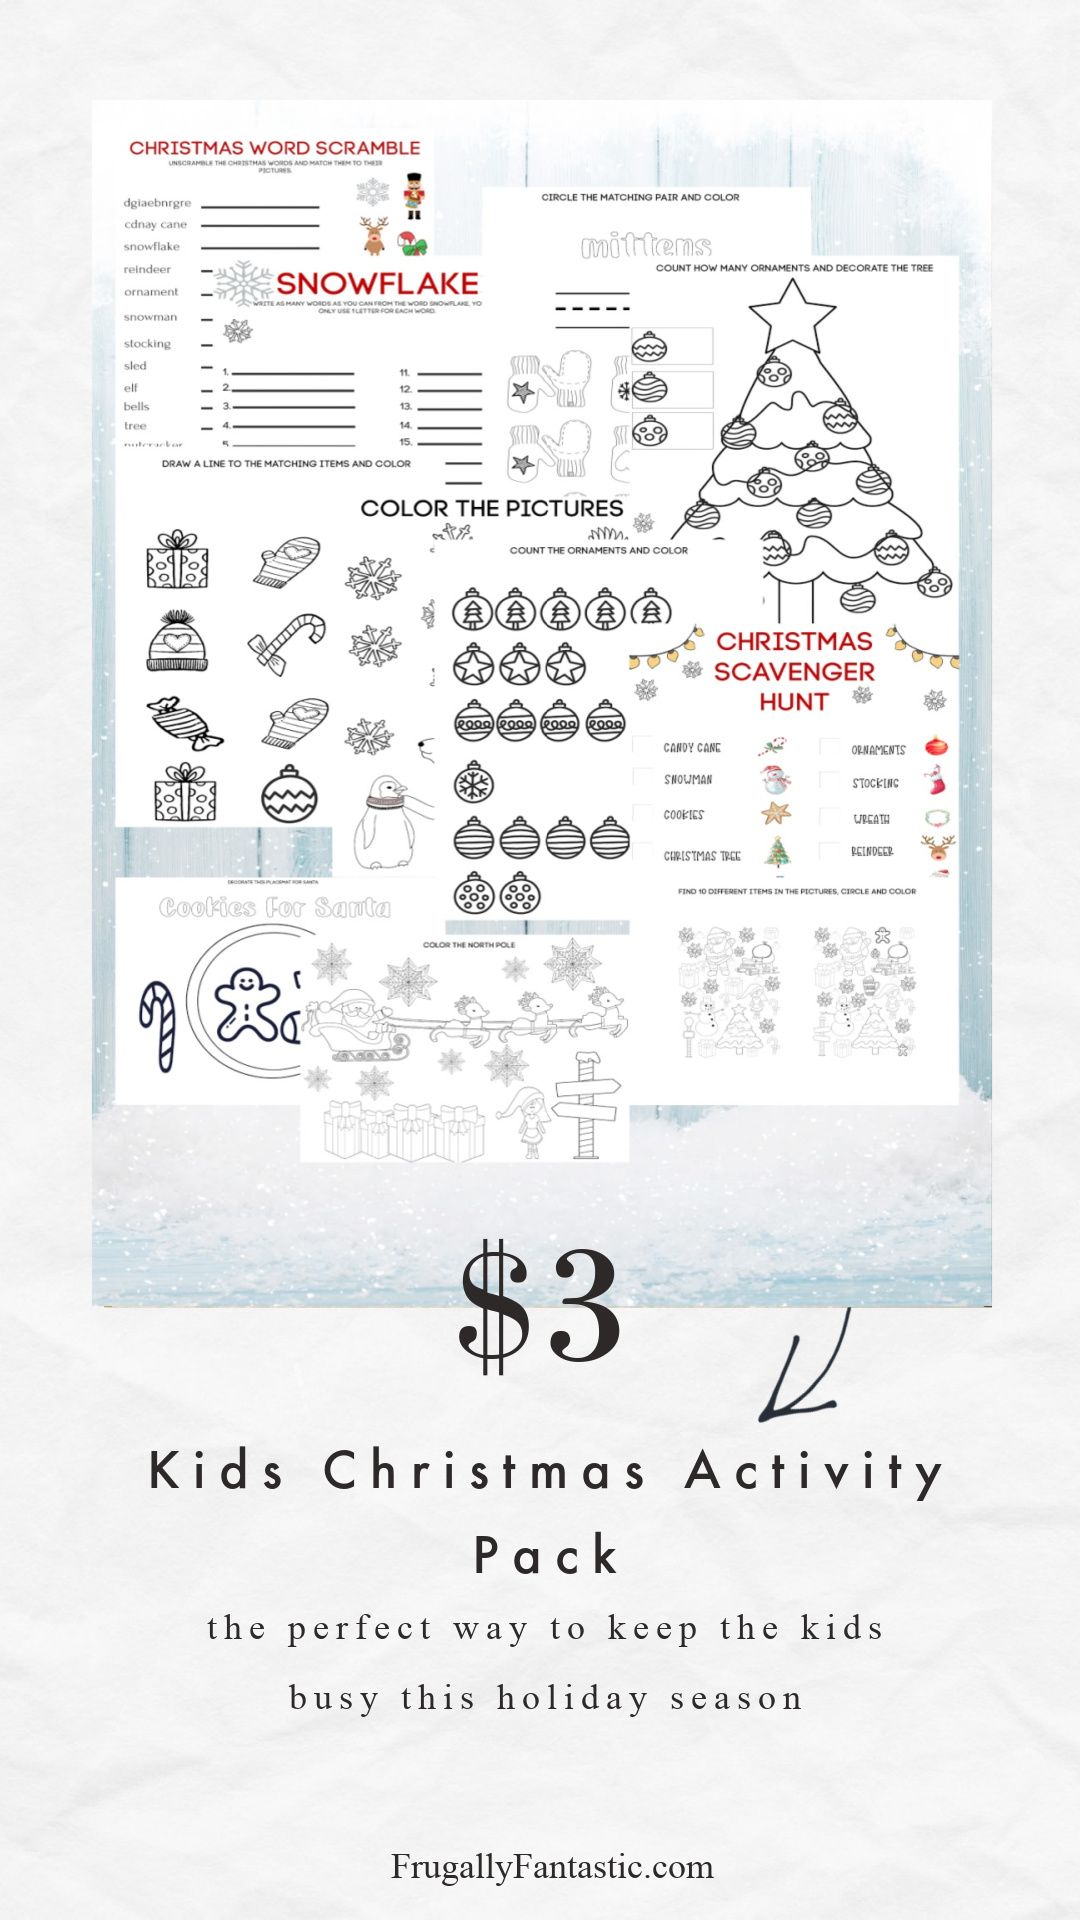 Kids Christmas Activity Pack FrugallyFantastic.com20